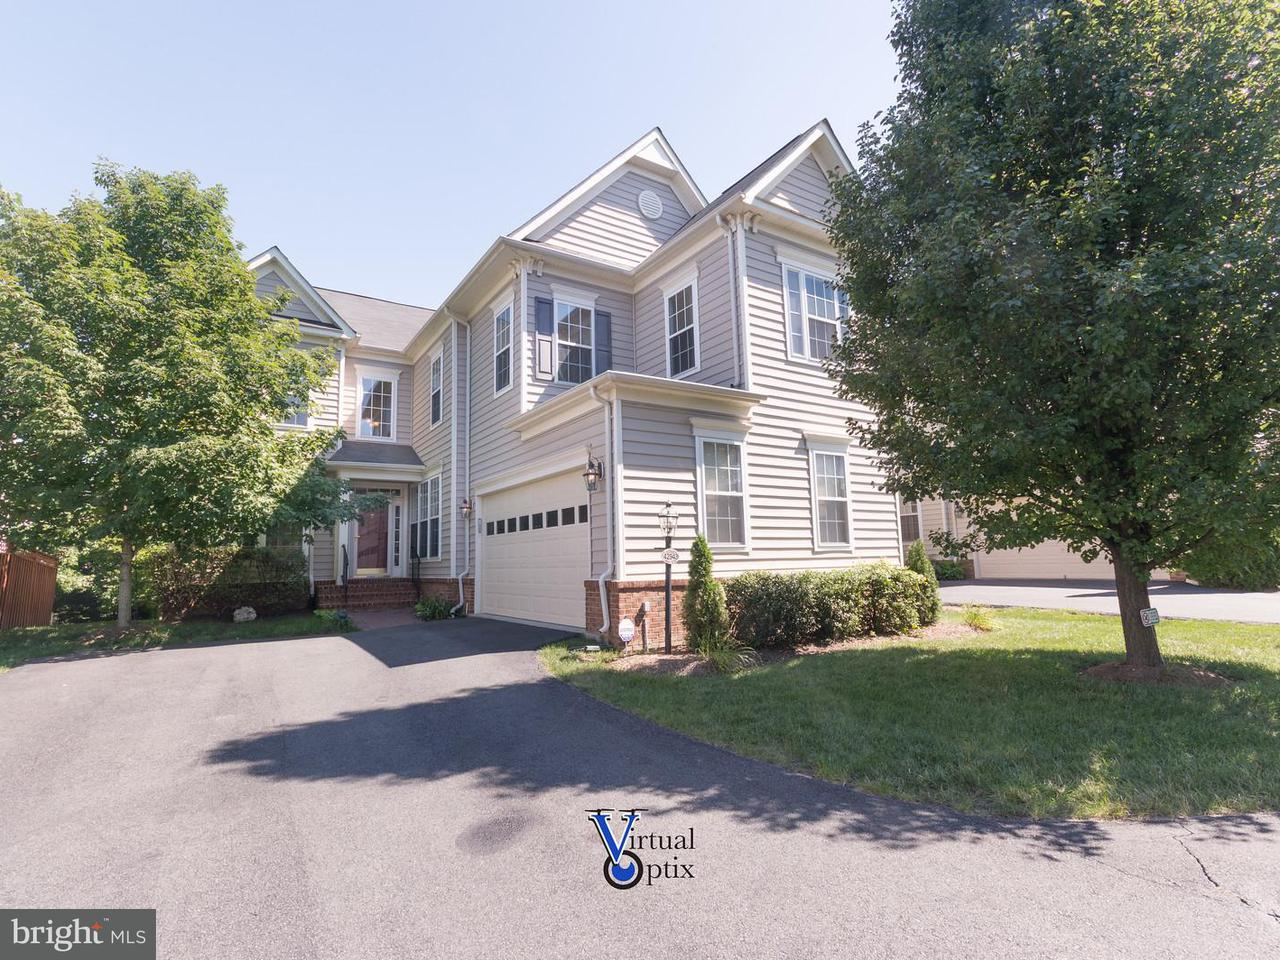 Single Family Home for Sale at 42943 PARK BROOKE Court 42943 PARK BROOKE Court Broadlands, Virginia 20148 United States